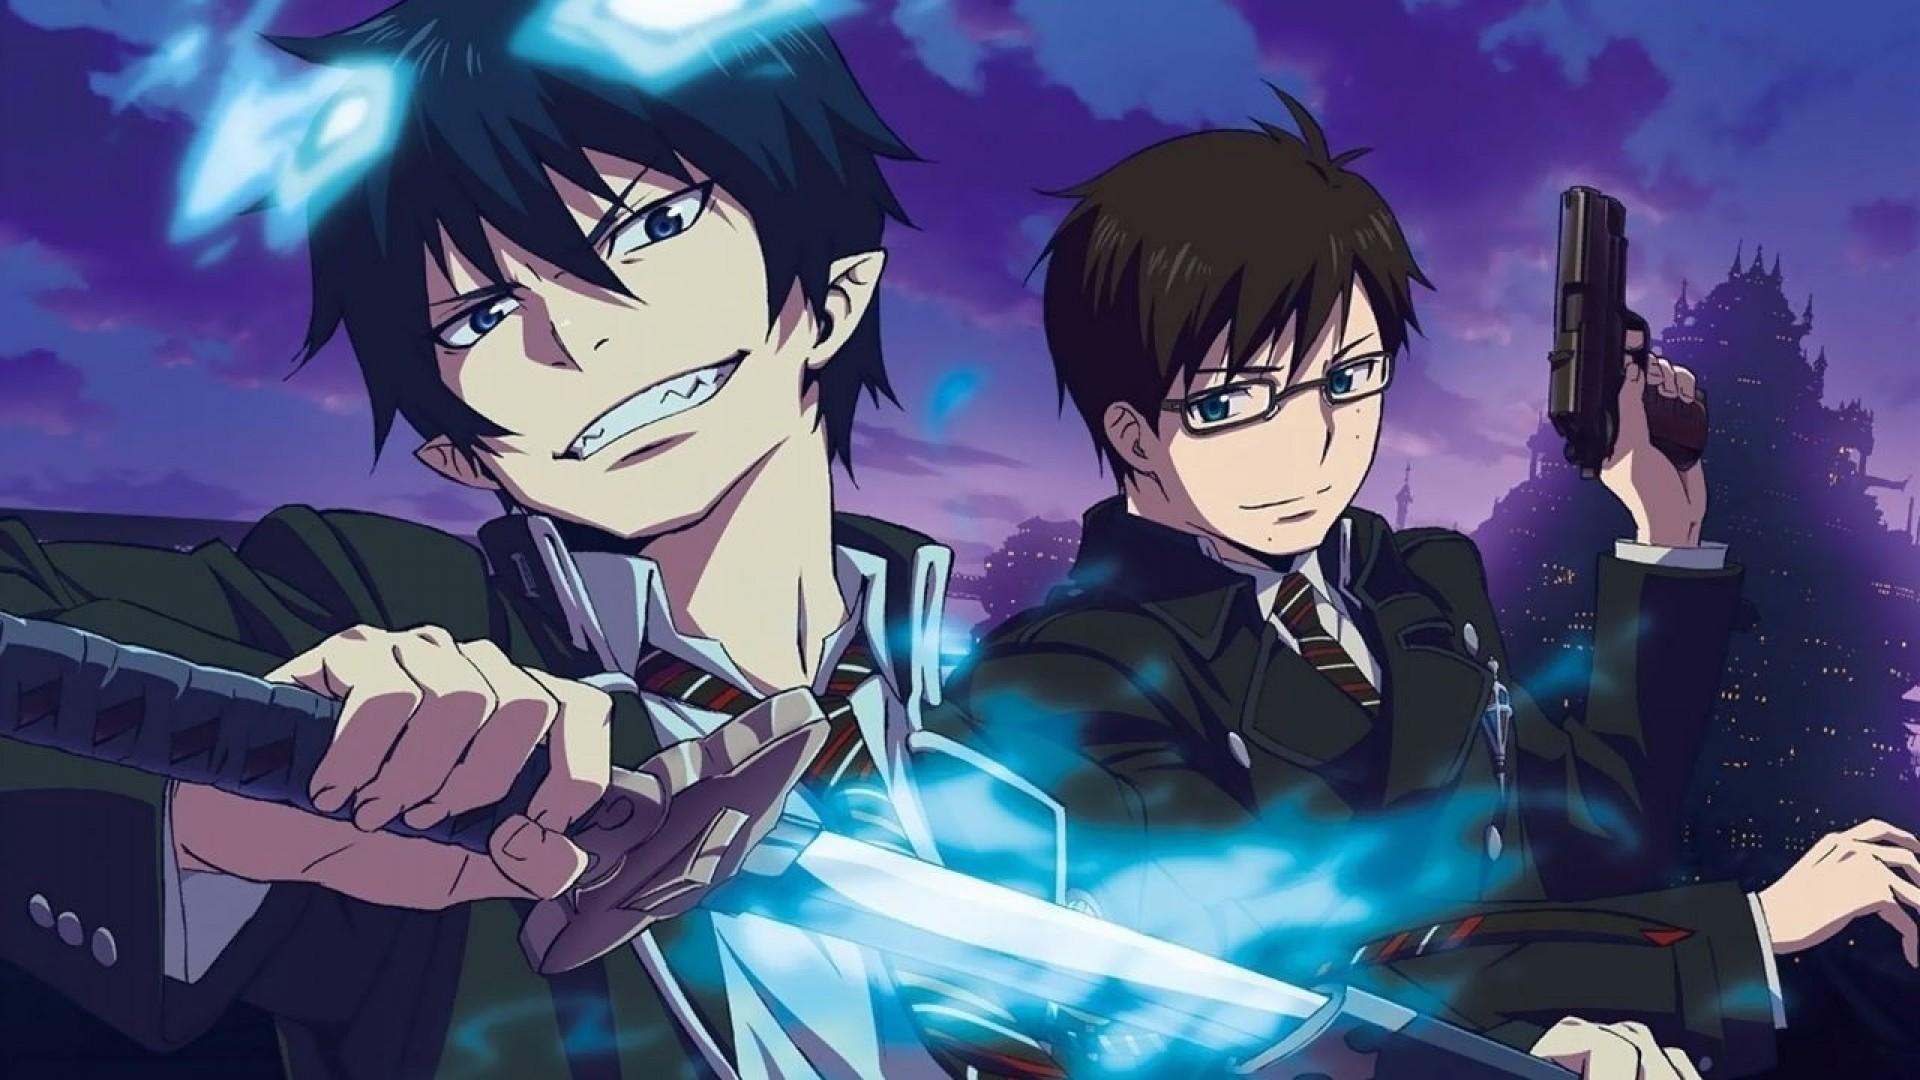 Res: 1920x1080, Anime Blue Exorcist Wallpaper HD 7 hd background hd screensavers hd